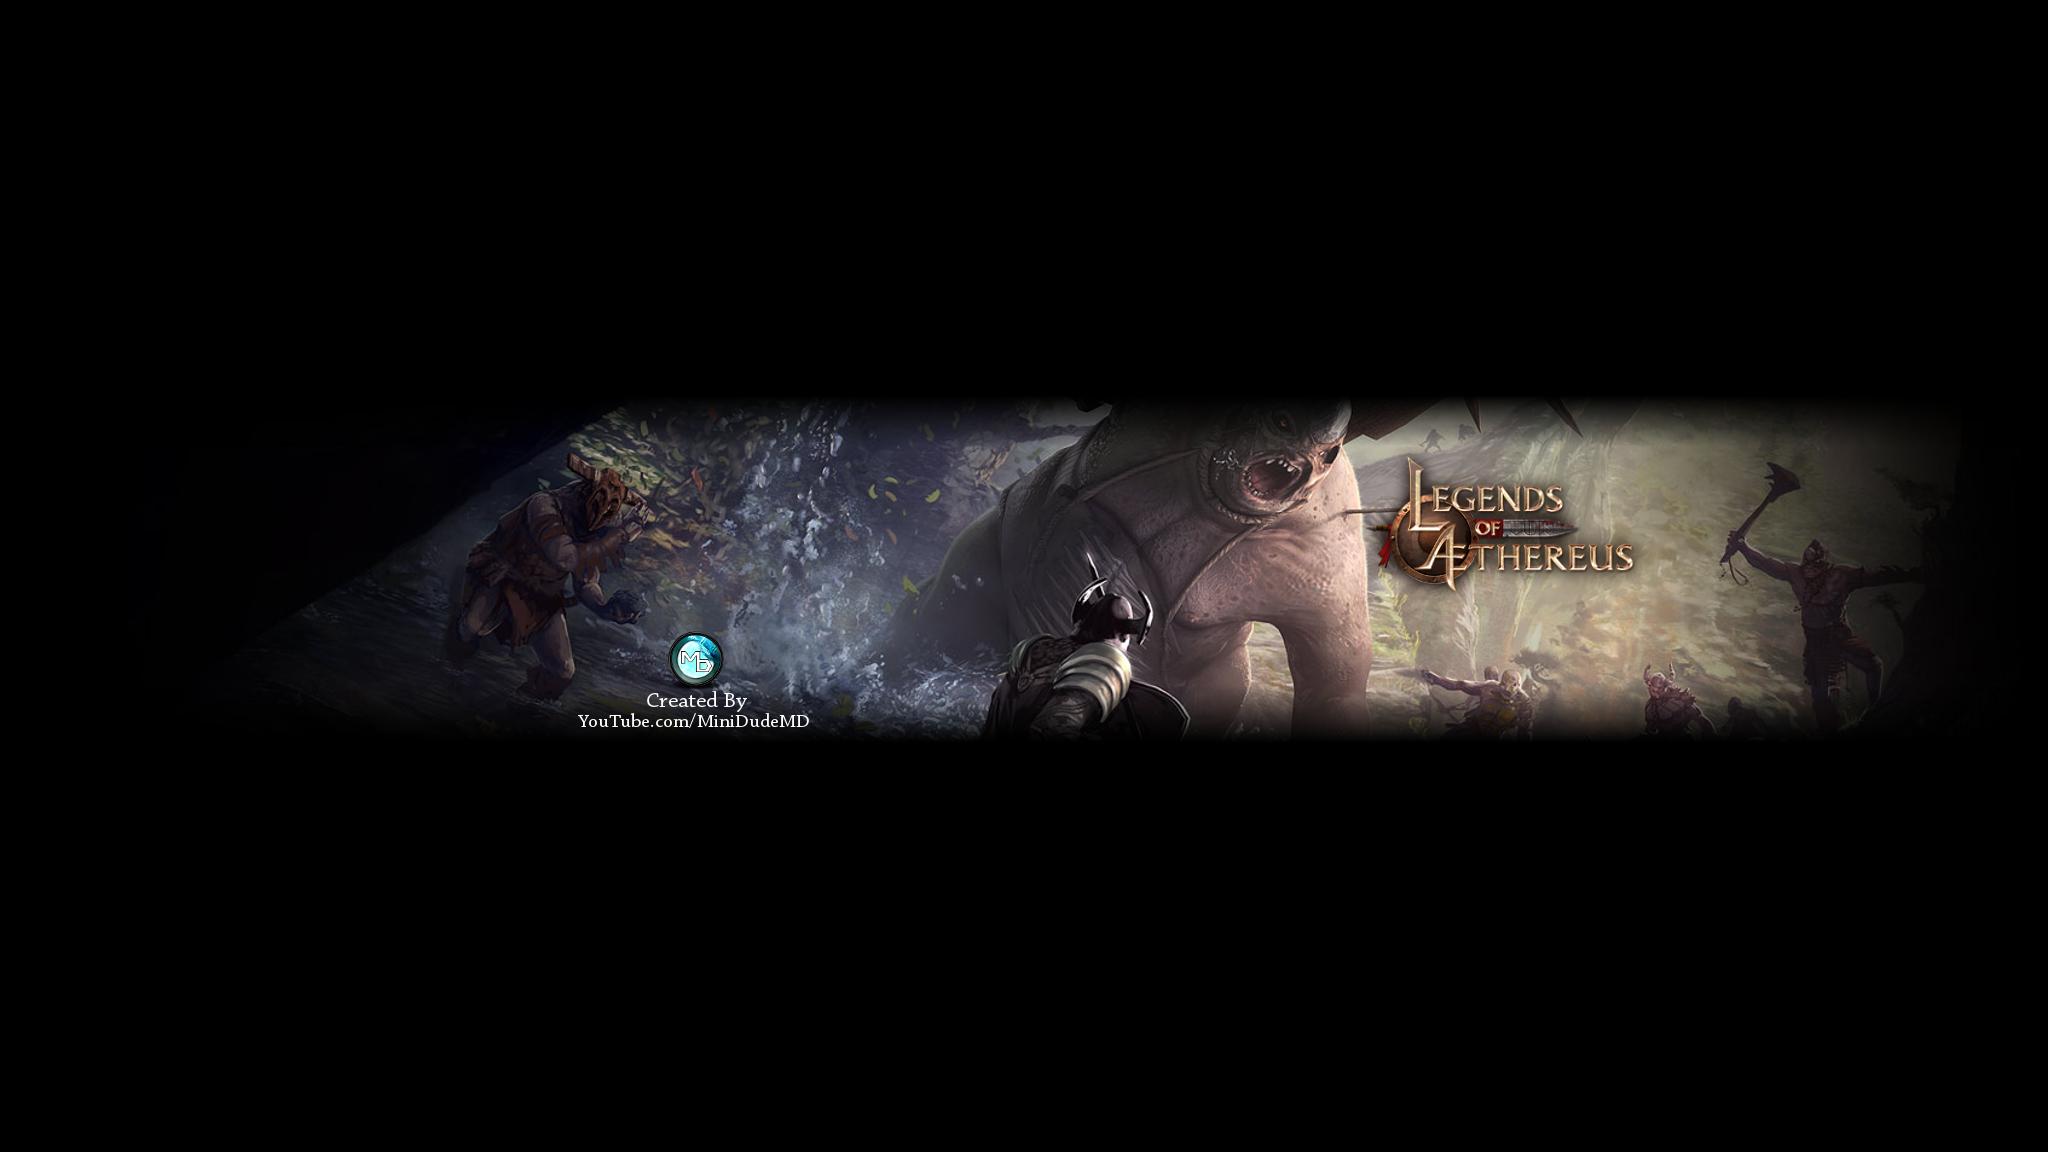 Legends Of Aethereus Youtube Banner V1 By Minidudemd On